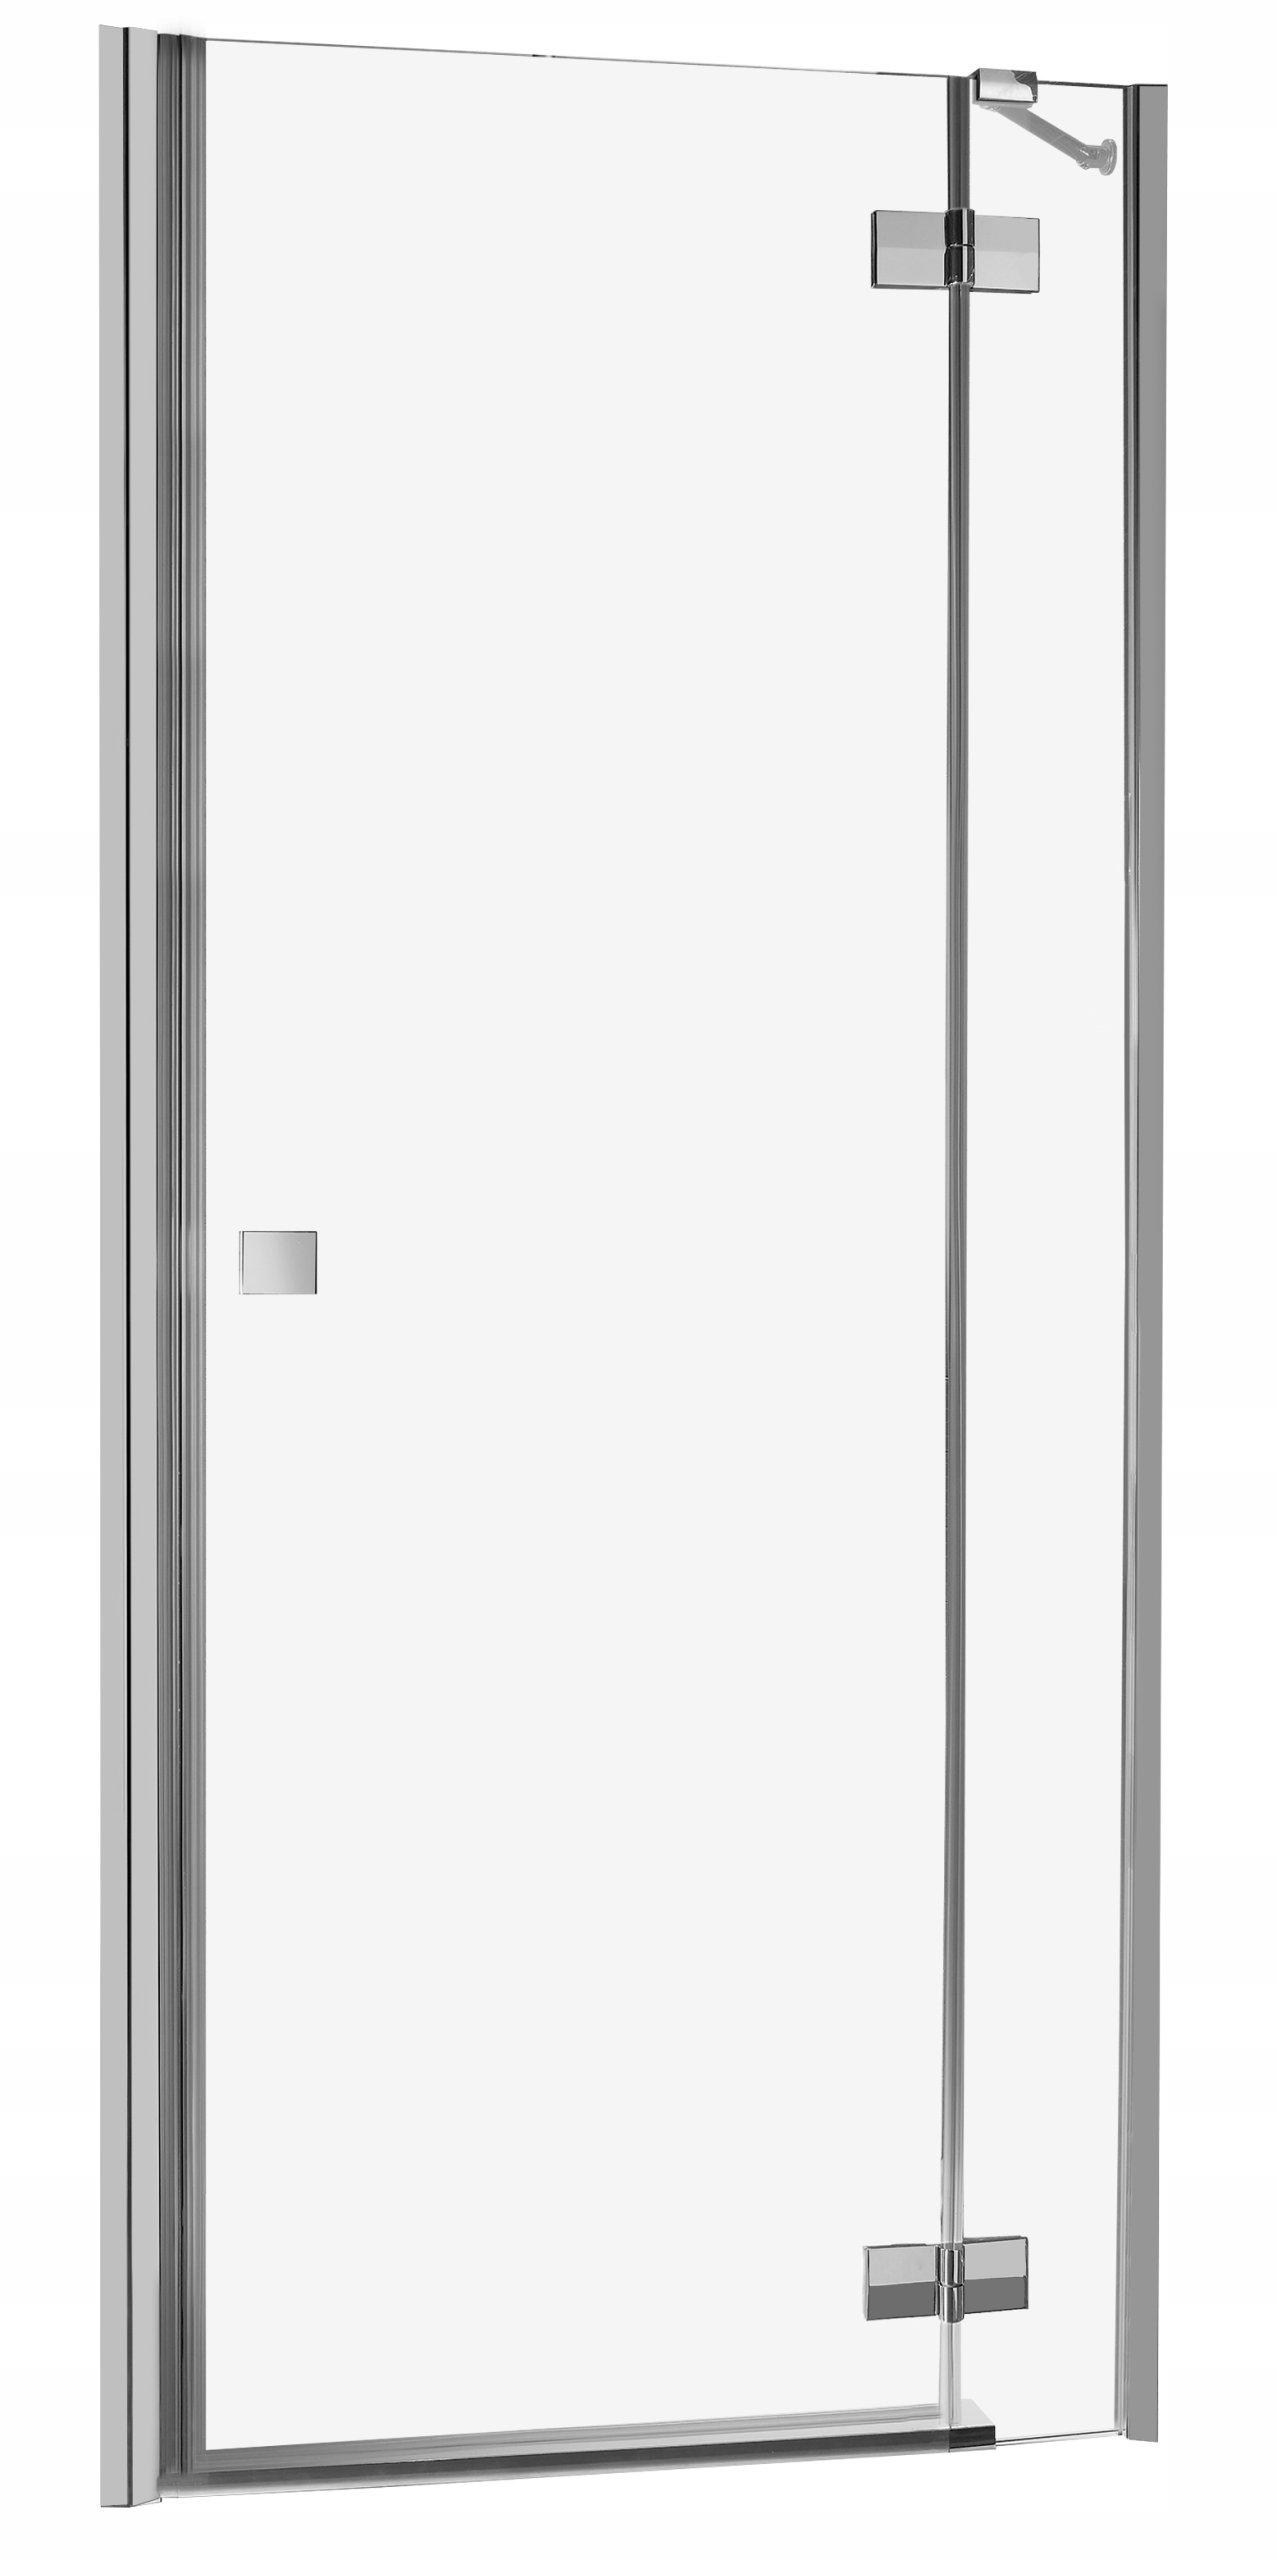 Almatea DWJ 90x195 RADAWAY sprchové dvere